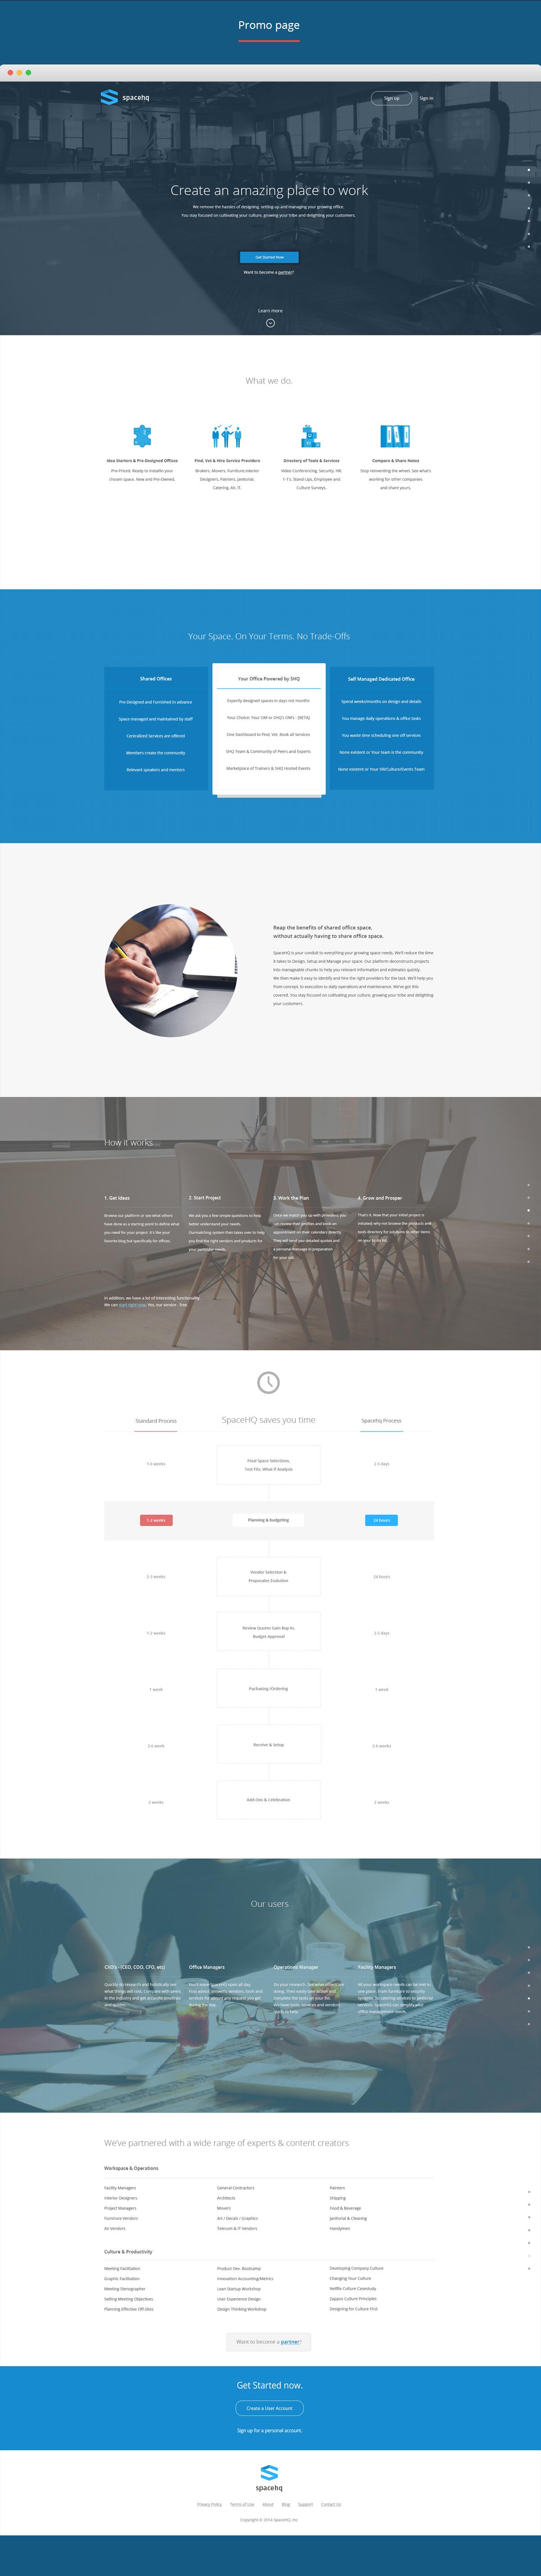 ui design ux UI Web desktop Office place Space  Startup